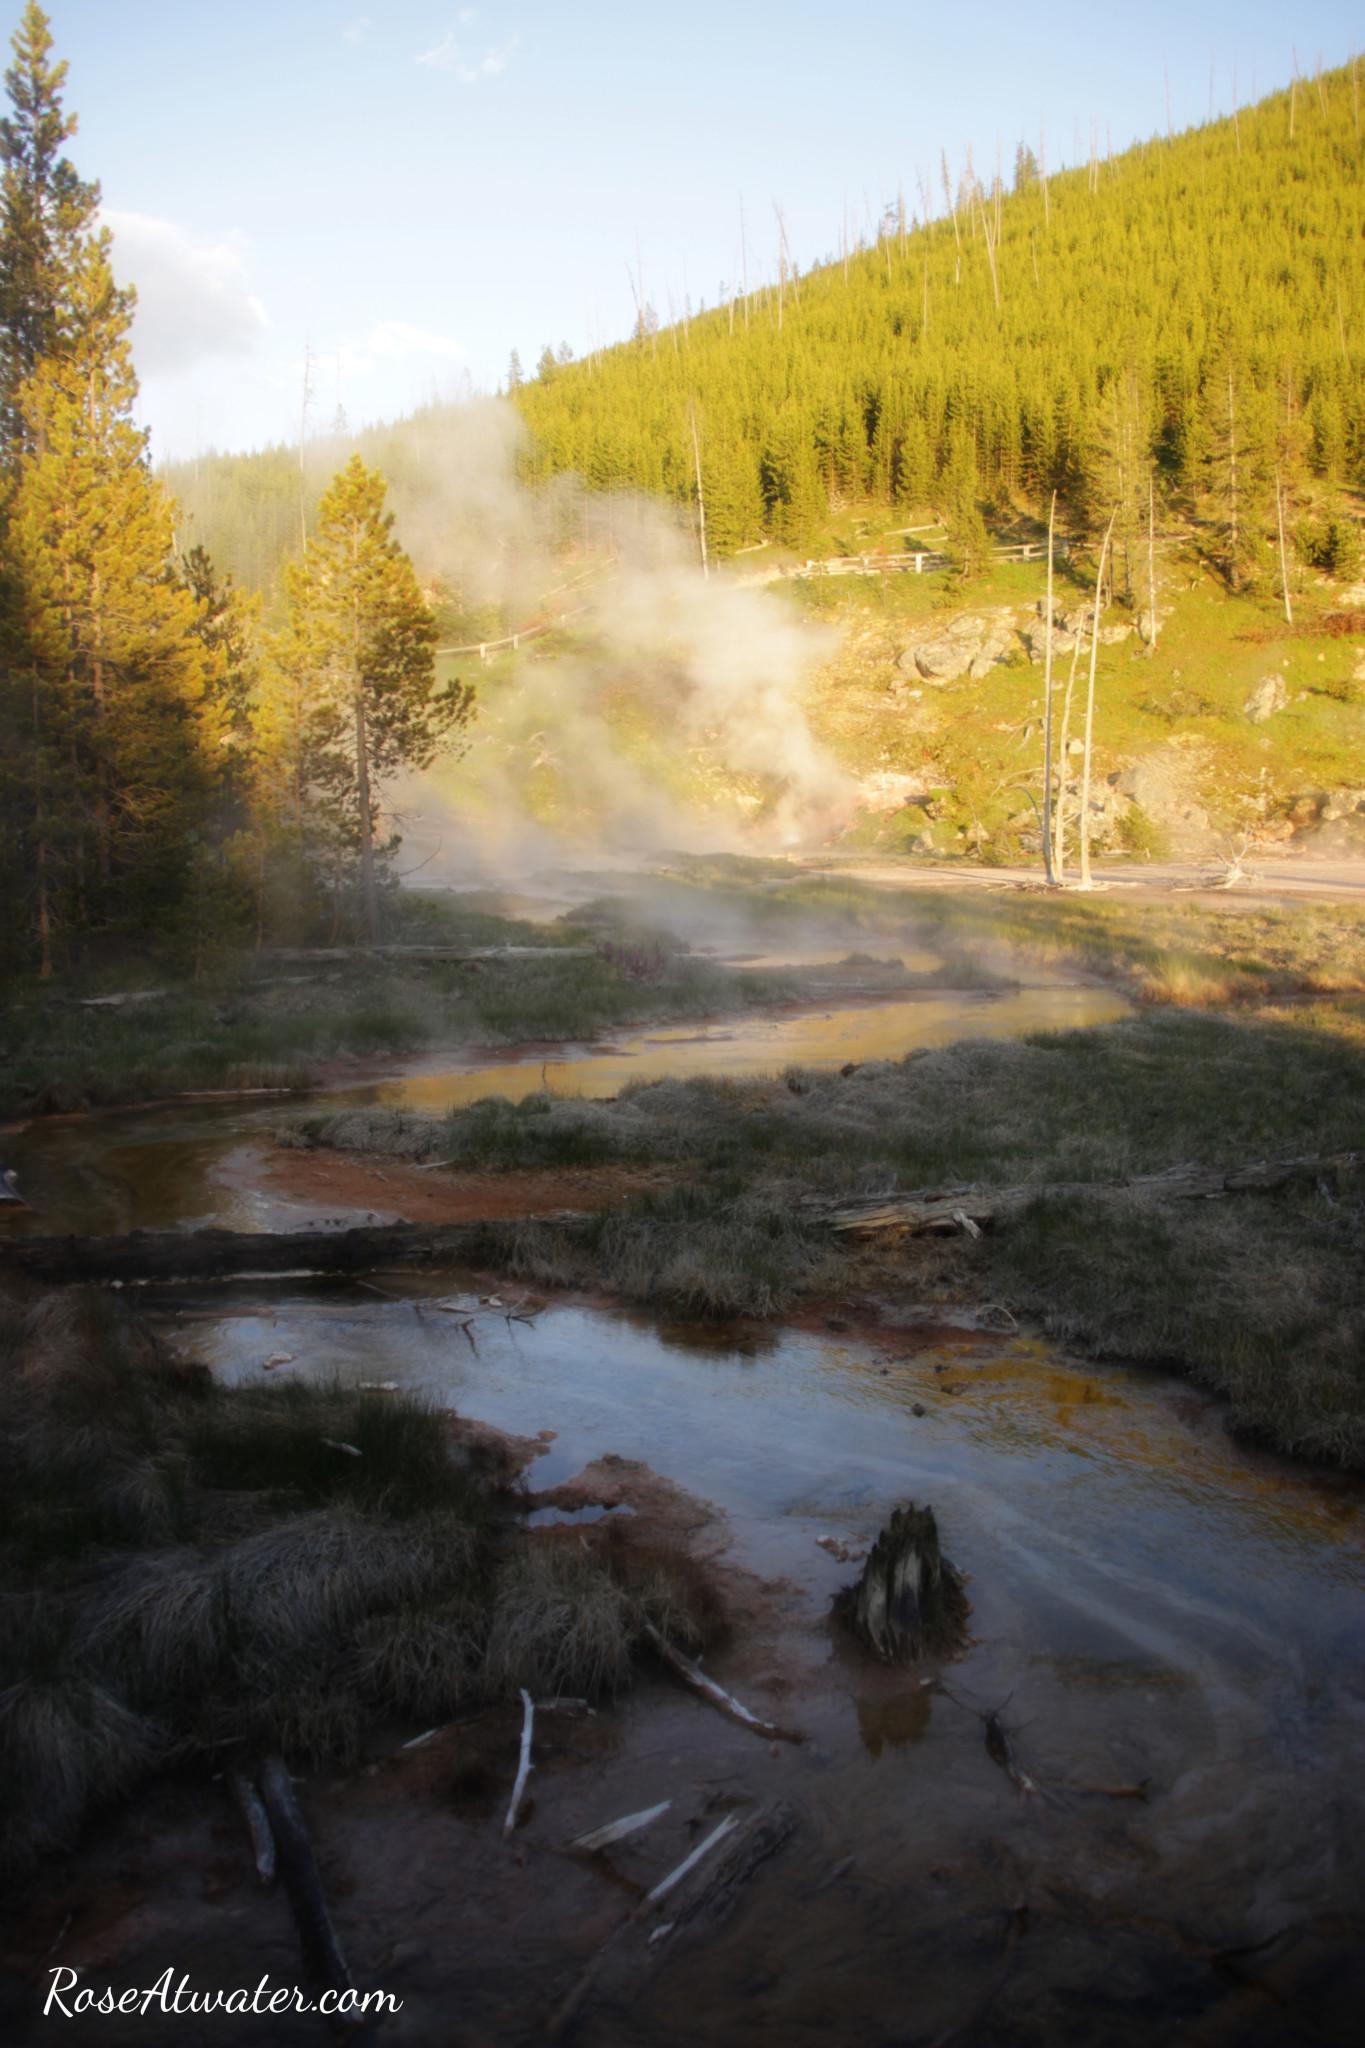 Road Trip 2015: Day 9 {Yellowstone, Old Faithful, Paint Pots & Wildlife!}